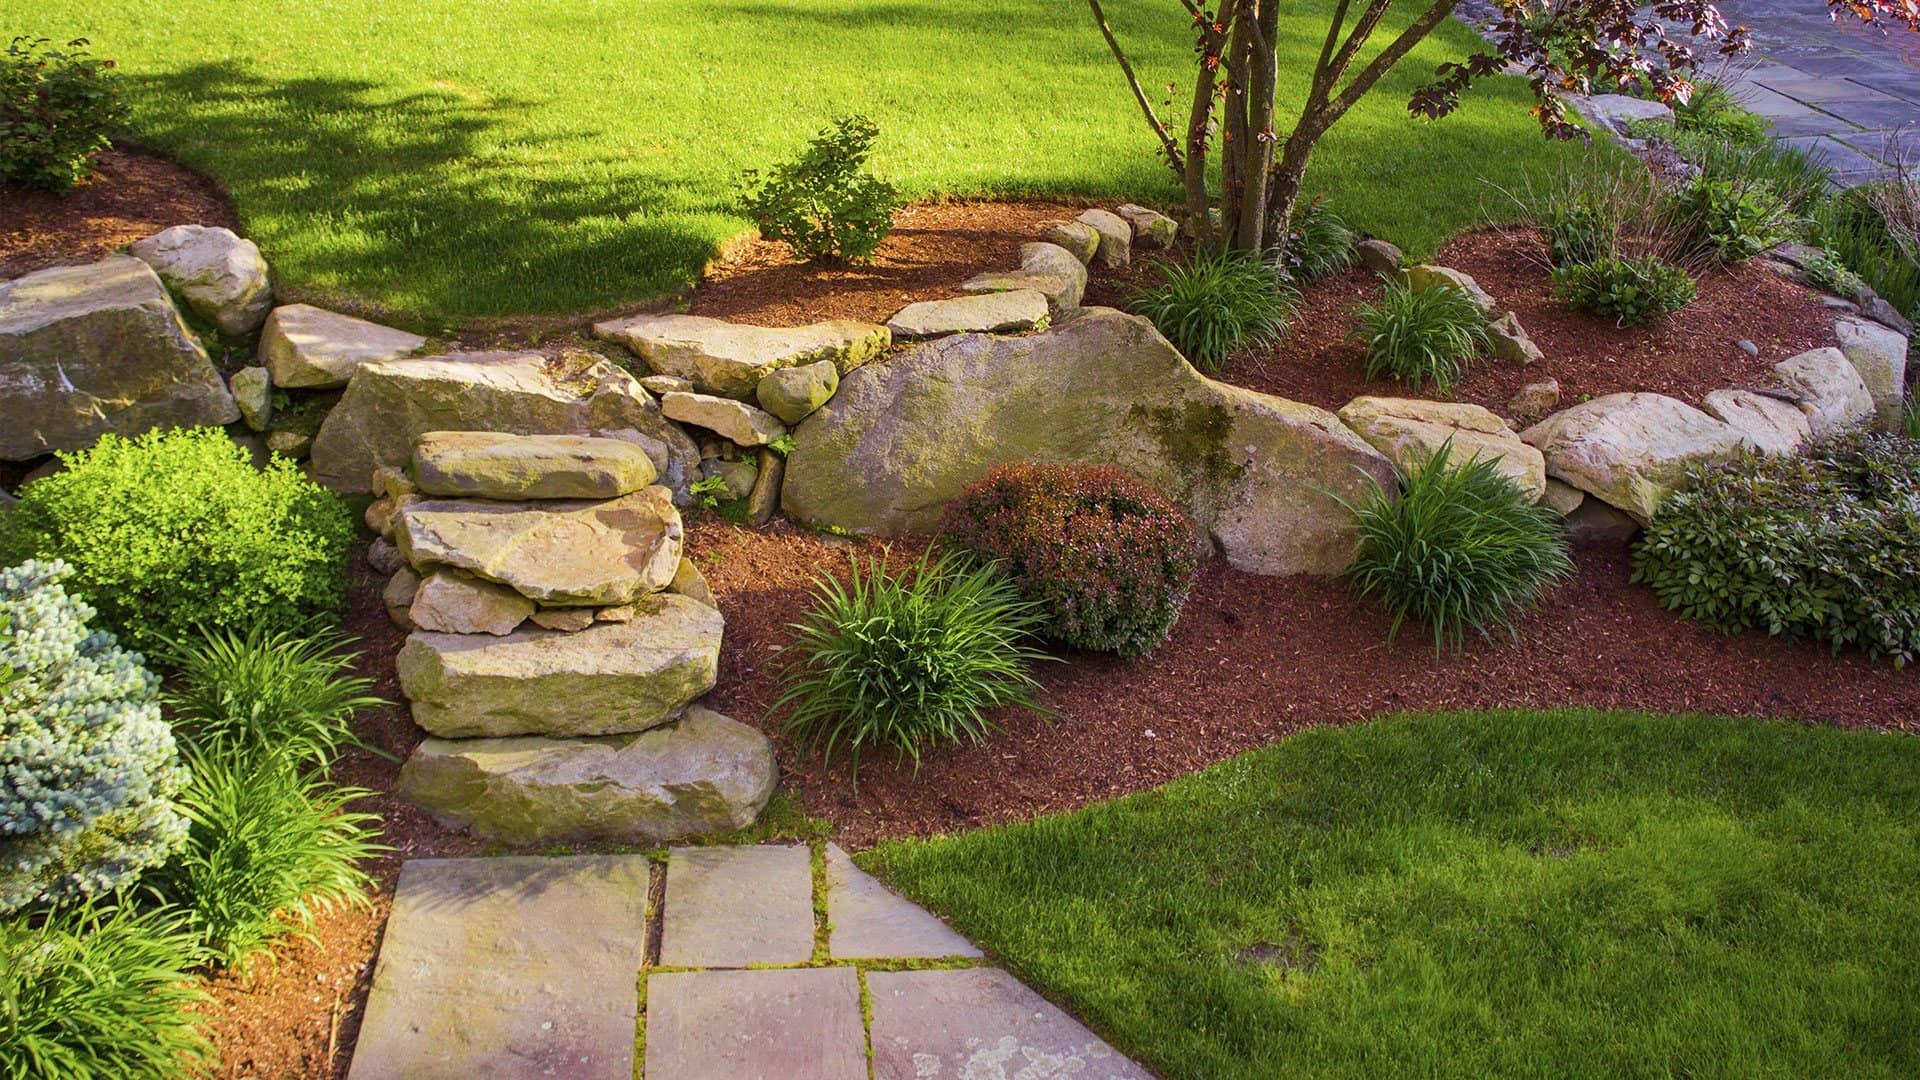 Cherry Oak Landscaping Lawn Care Services, Landscape Design and Landscaping Services slide 3